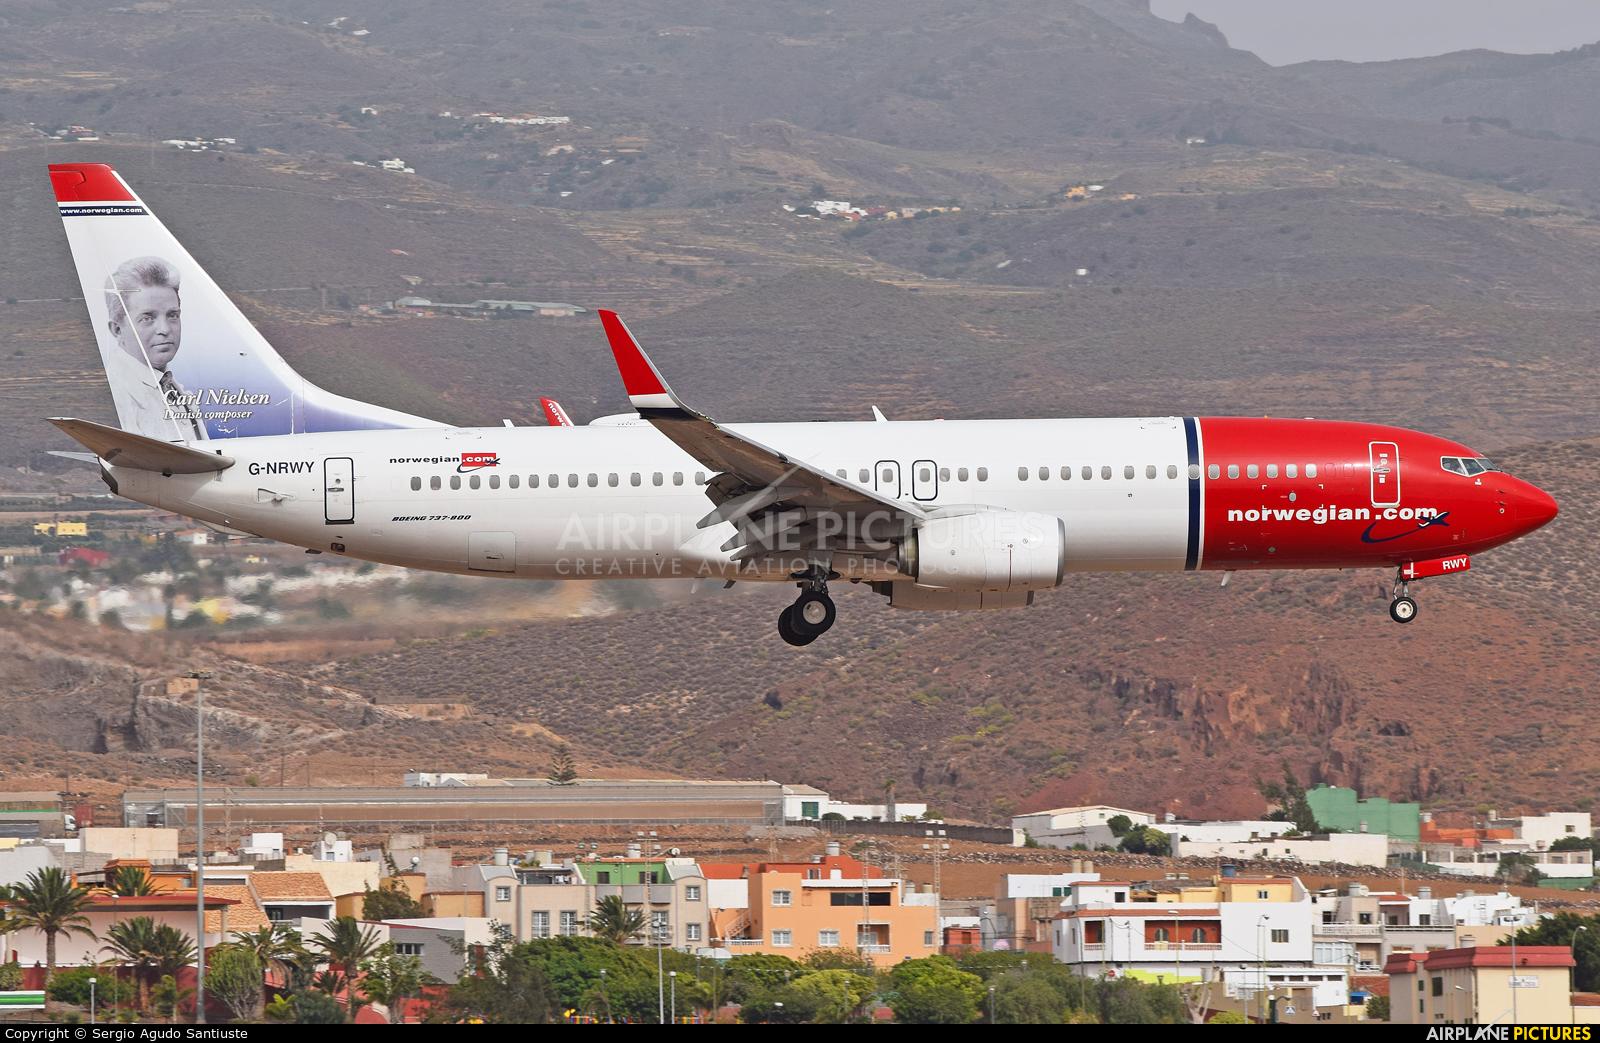 Norwegian Air Shuttle G-NRWY aircraft at Aeropuerto de Gran Canaria